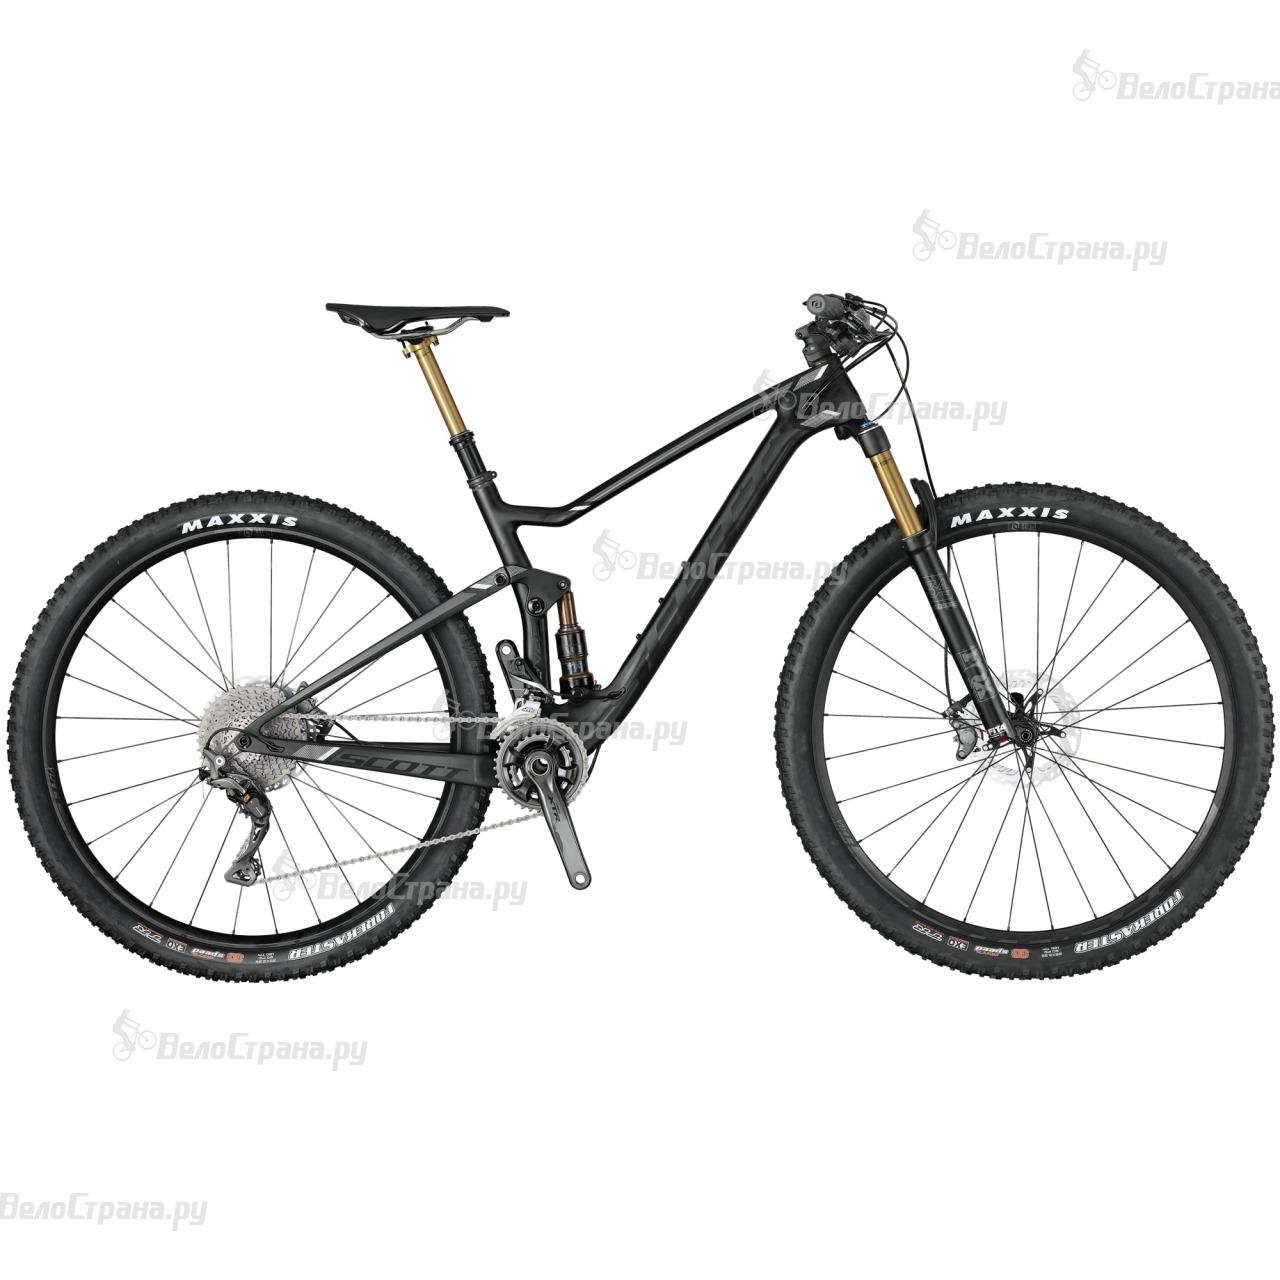 Велосипед Scott Spark 700 Premium (2017) велосипед scott spark 700 premium 2015